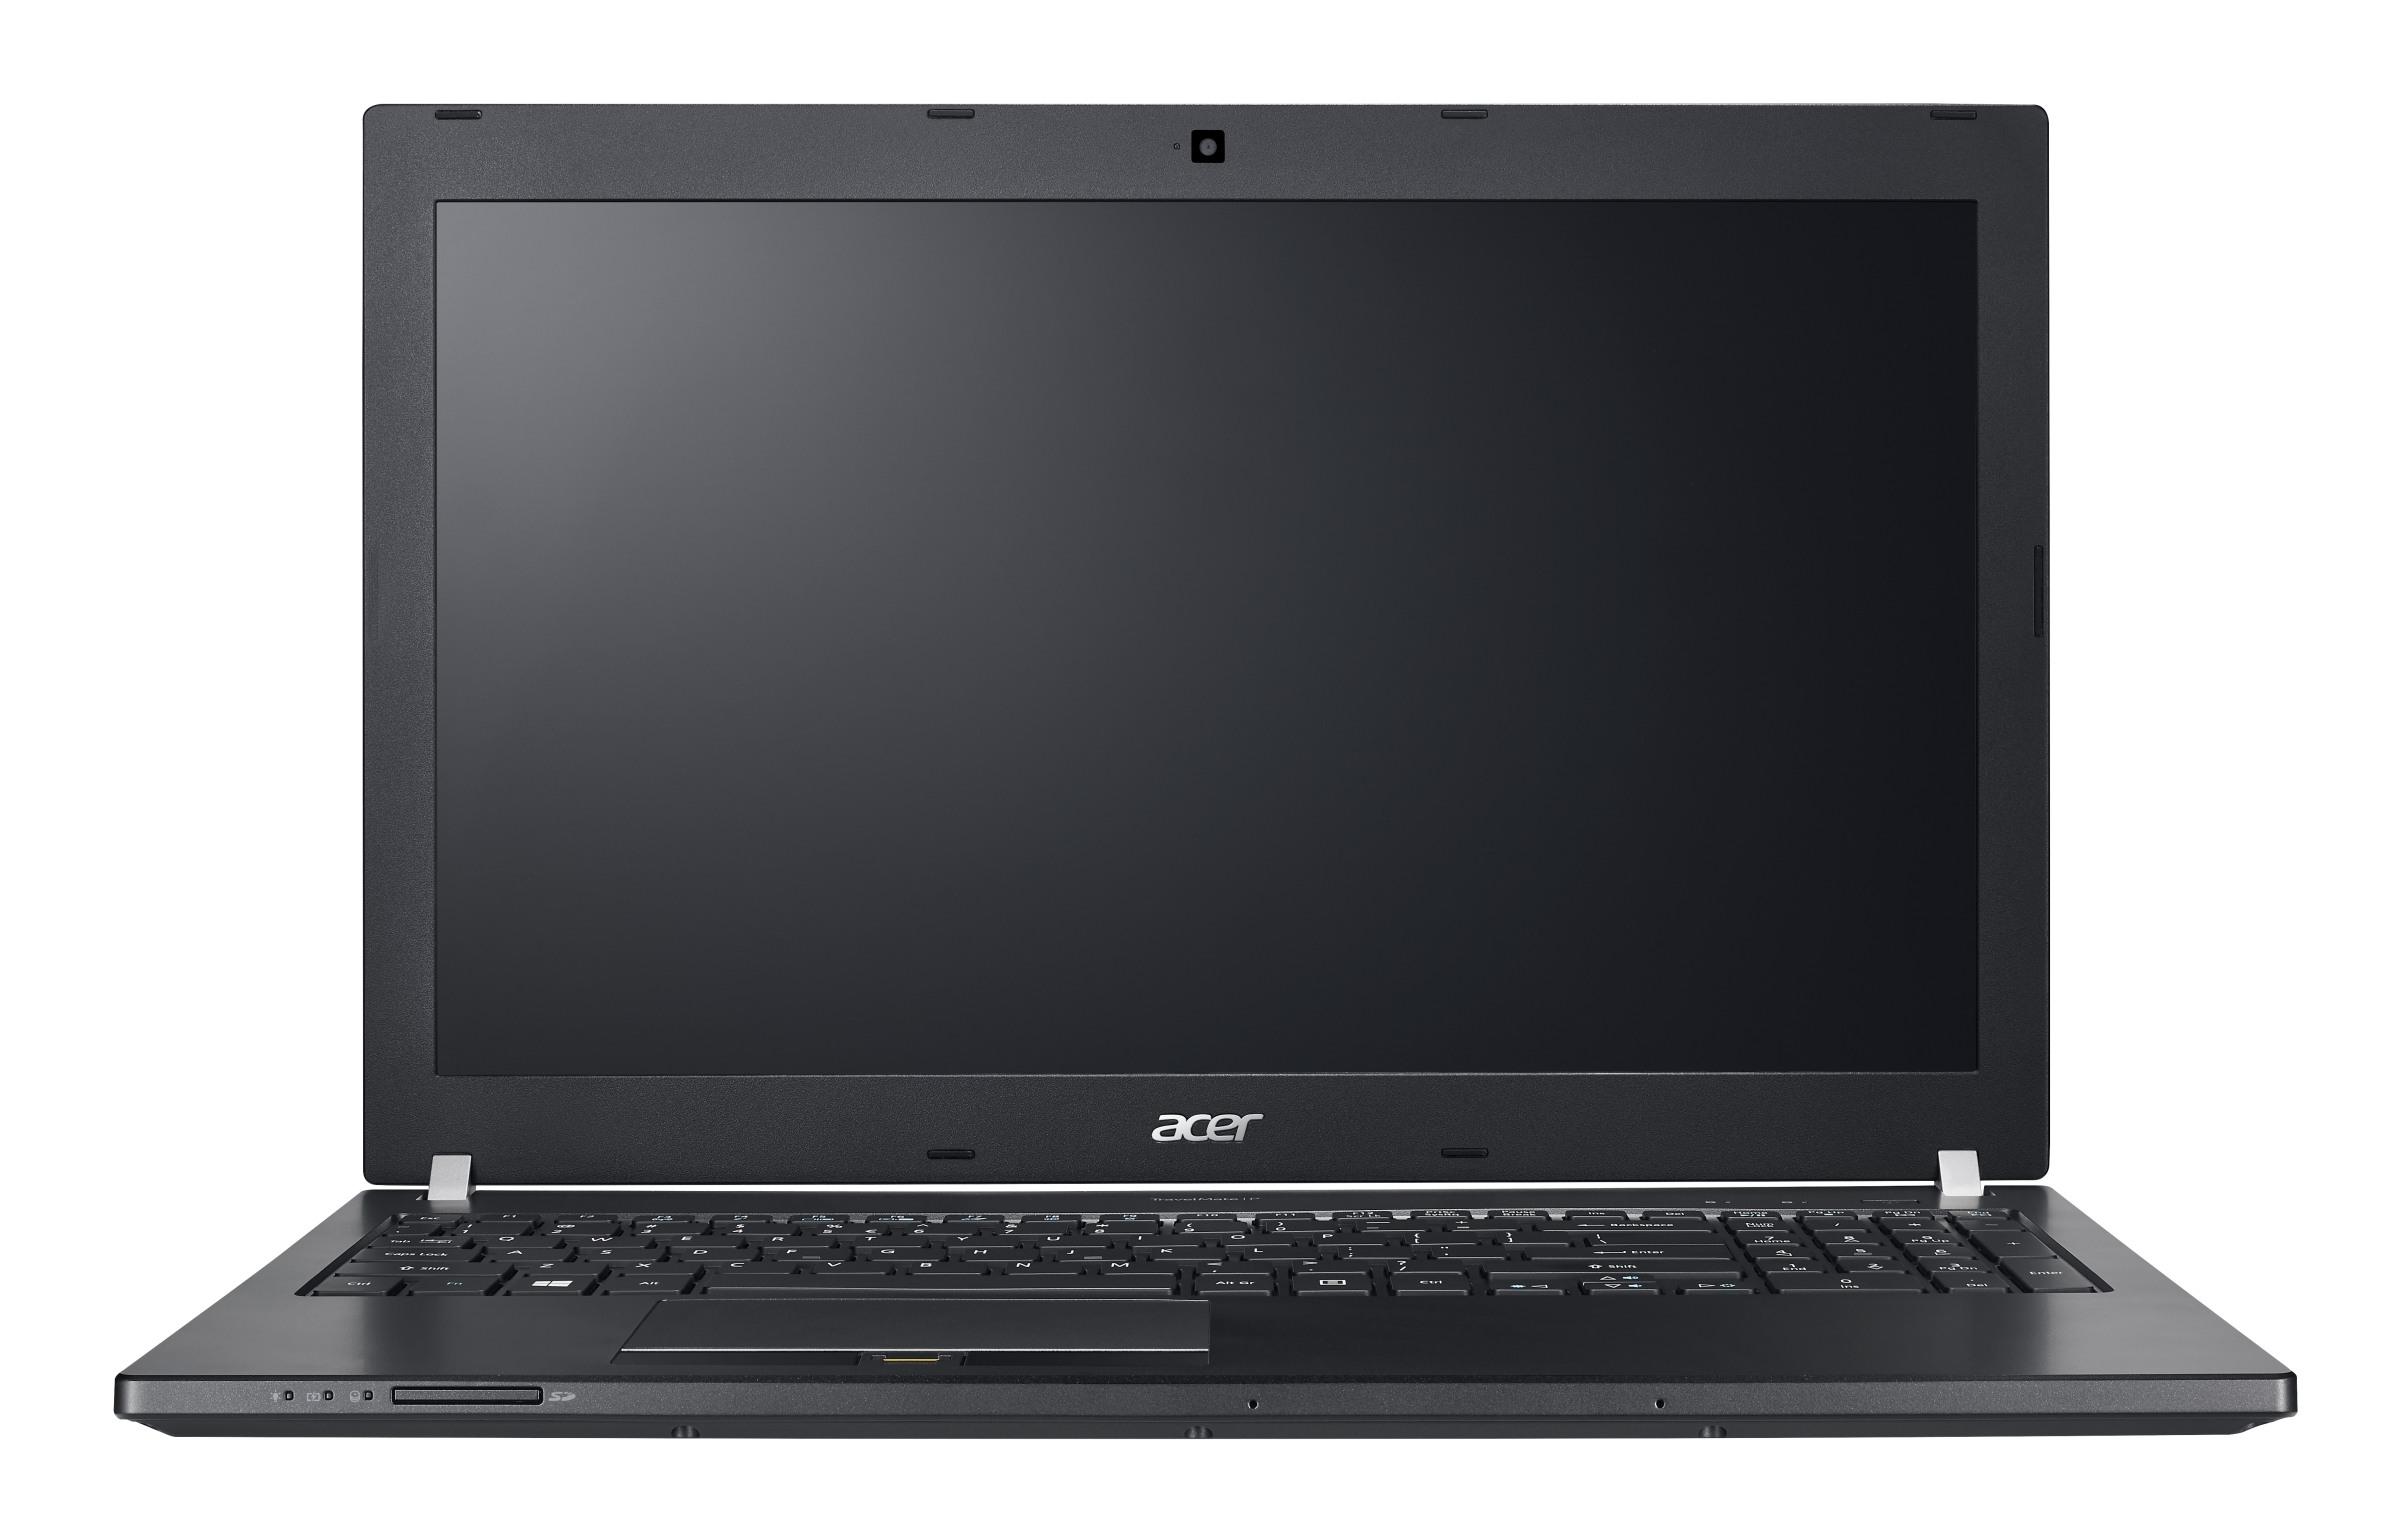 "Acer P658-G2-M-77B0 i7-7500U/8GB OB+N/512 GB SSD/15.6"" FHD IPS matný/HD Graphics/W10 Pro"